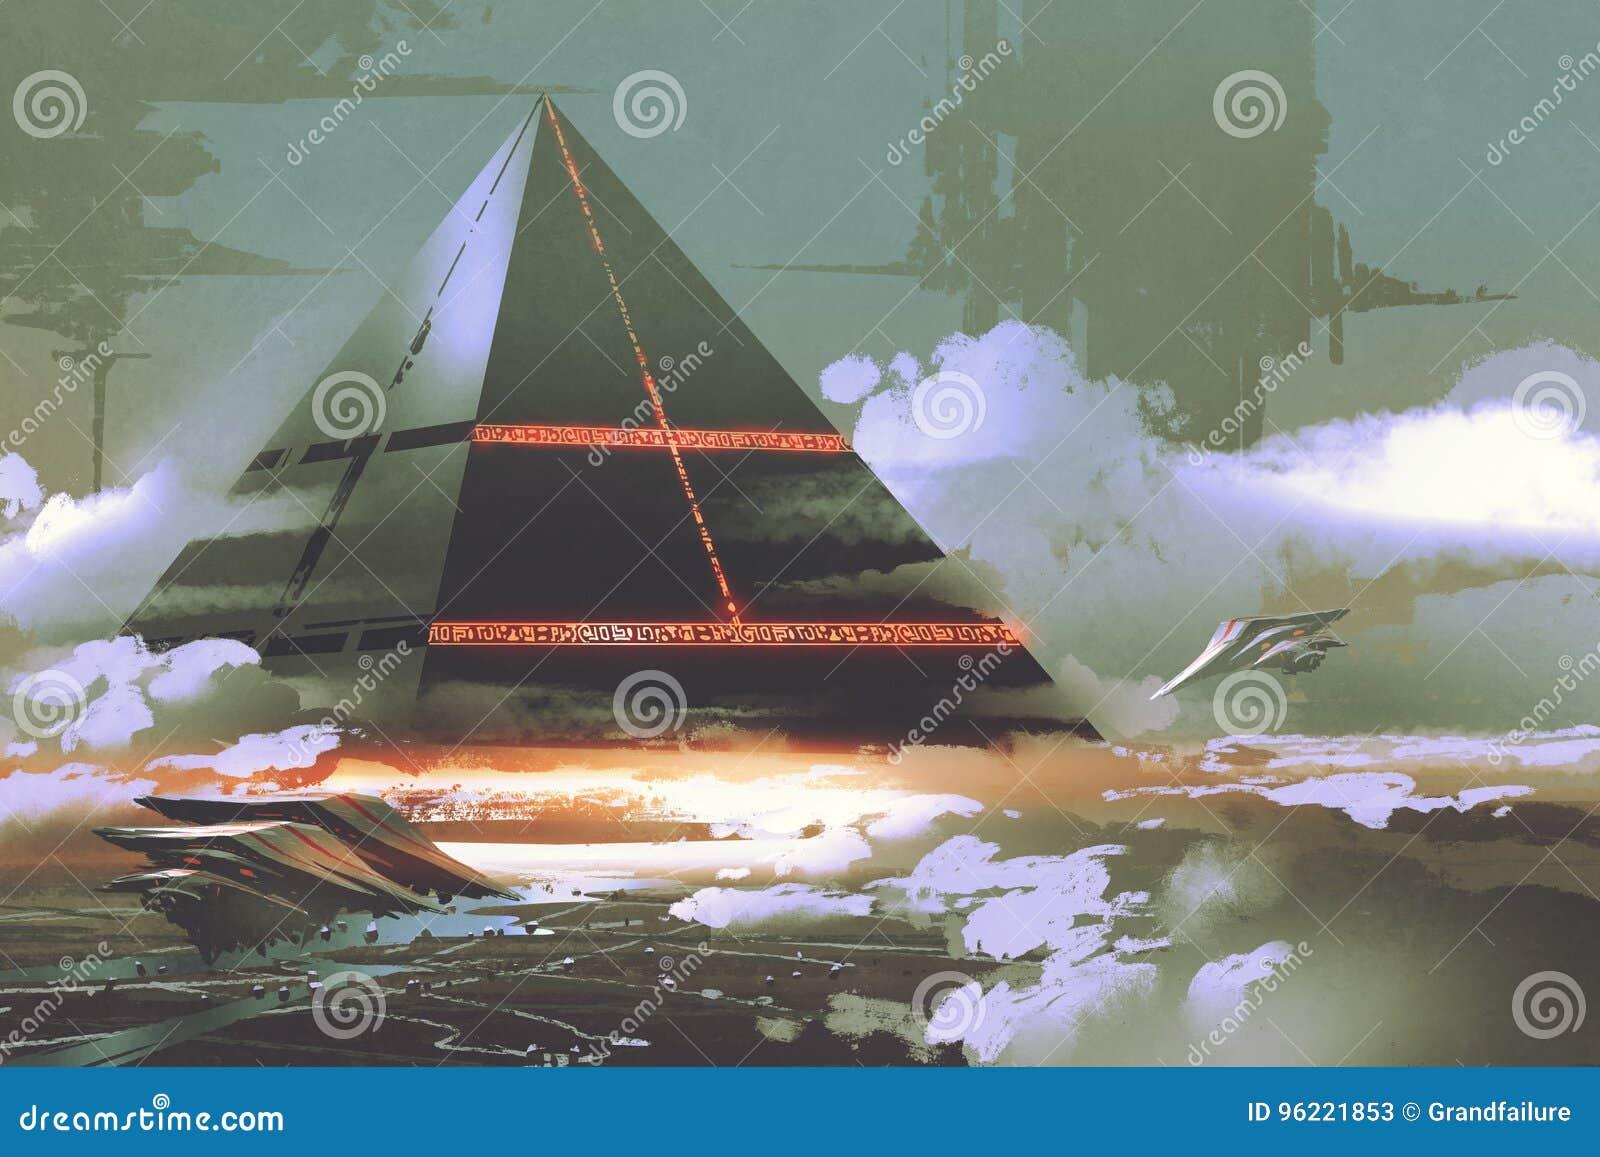 Futuristic black pyramid floating over earth surface